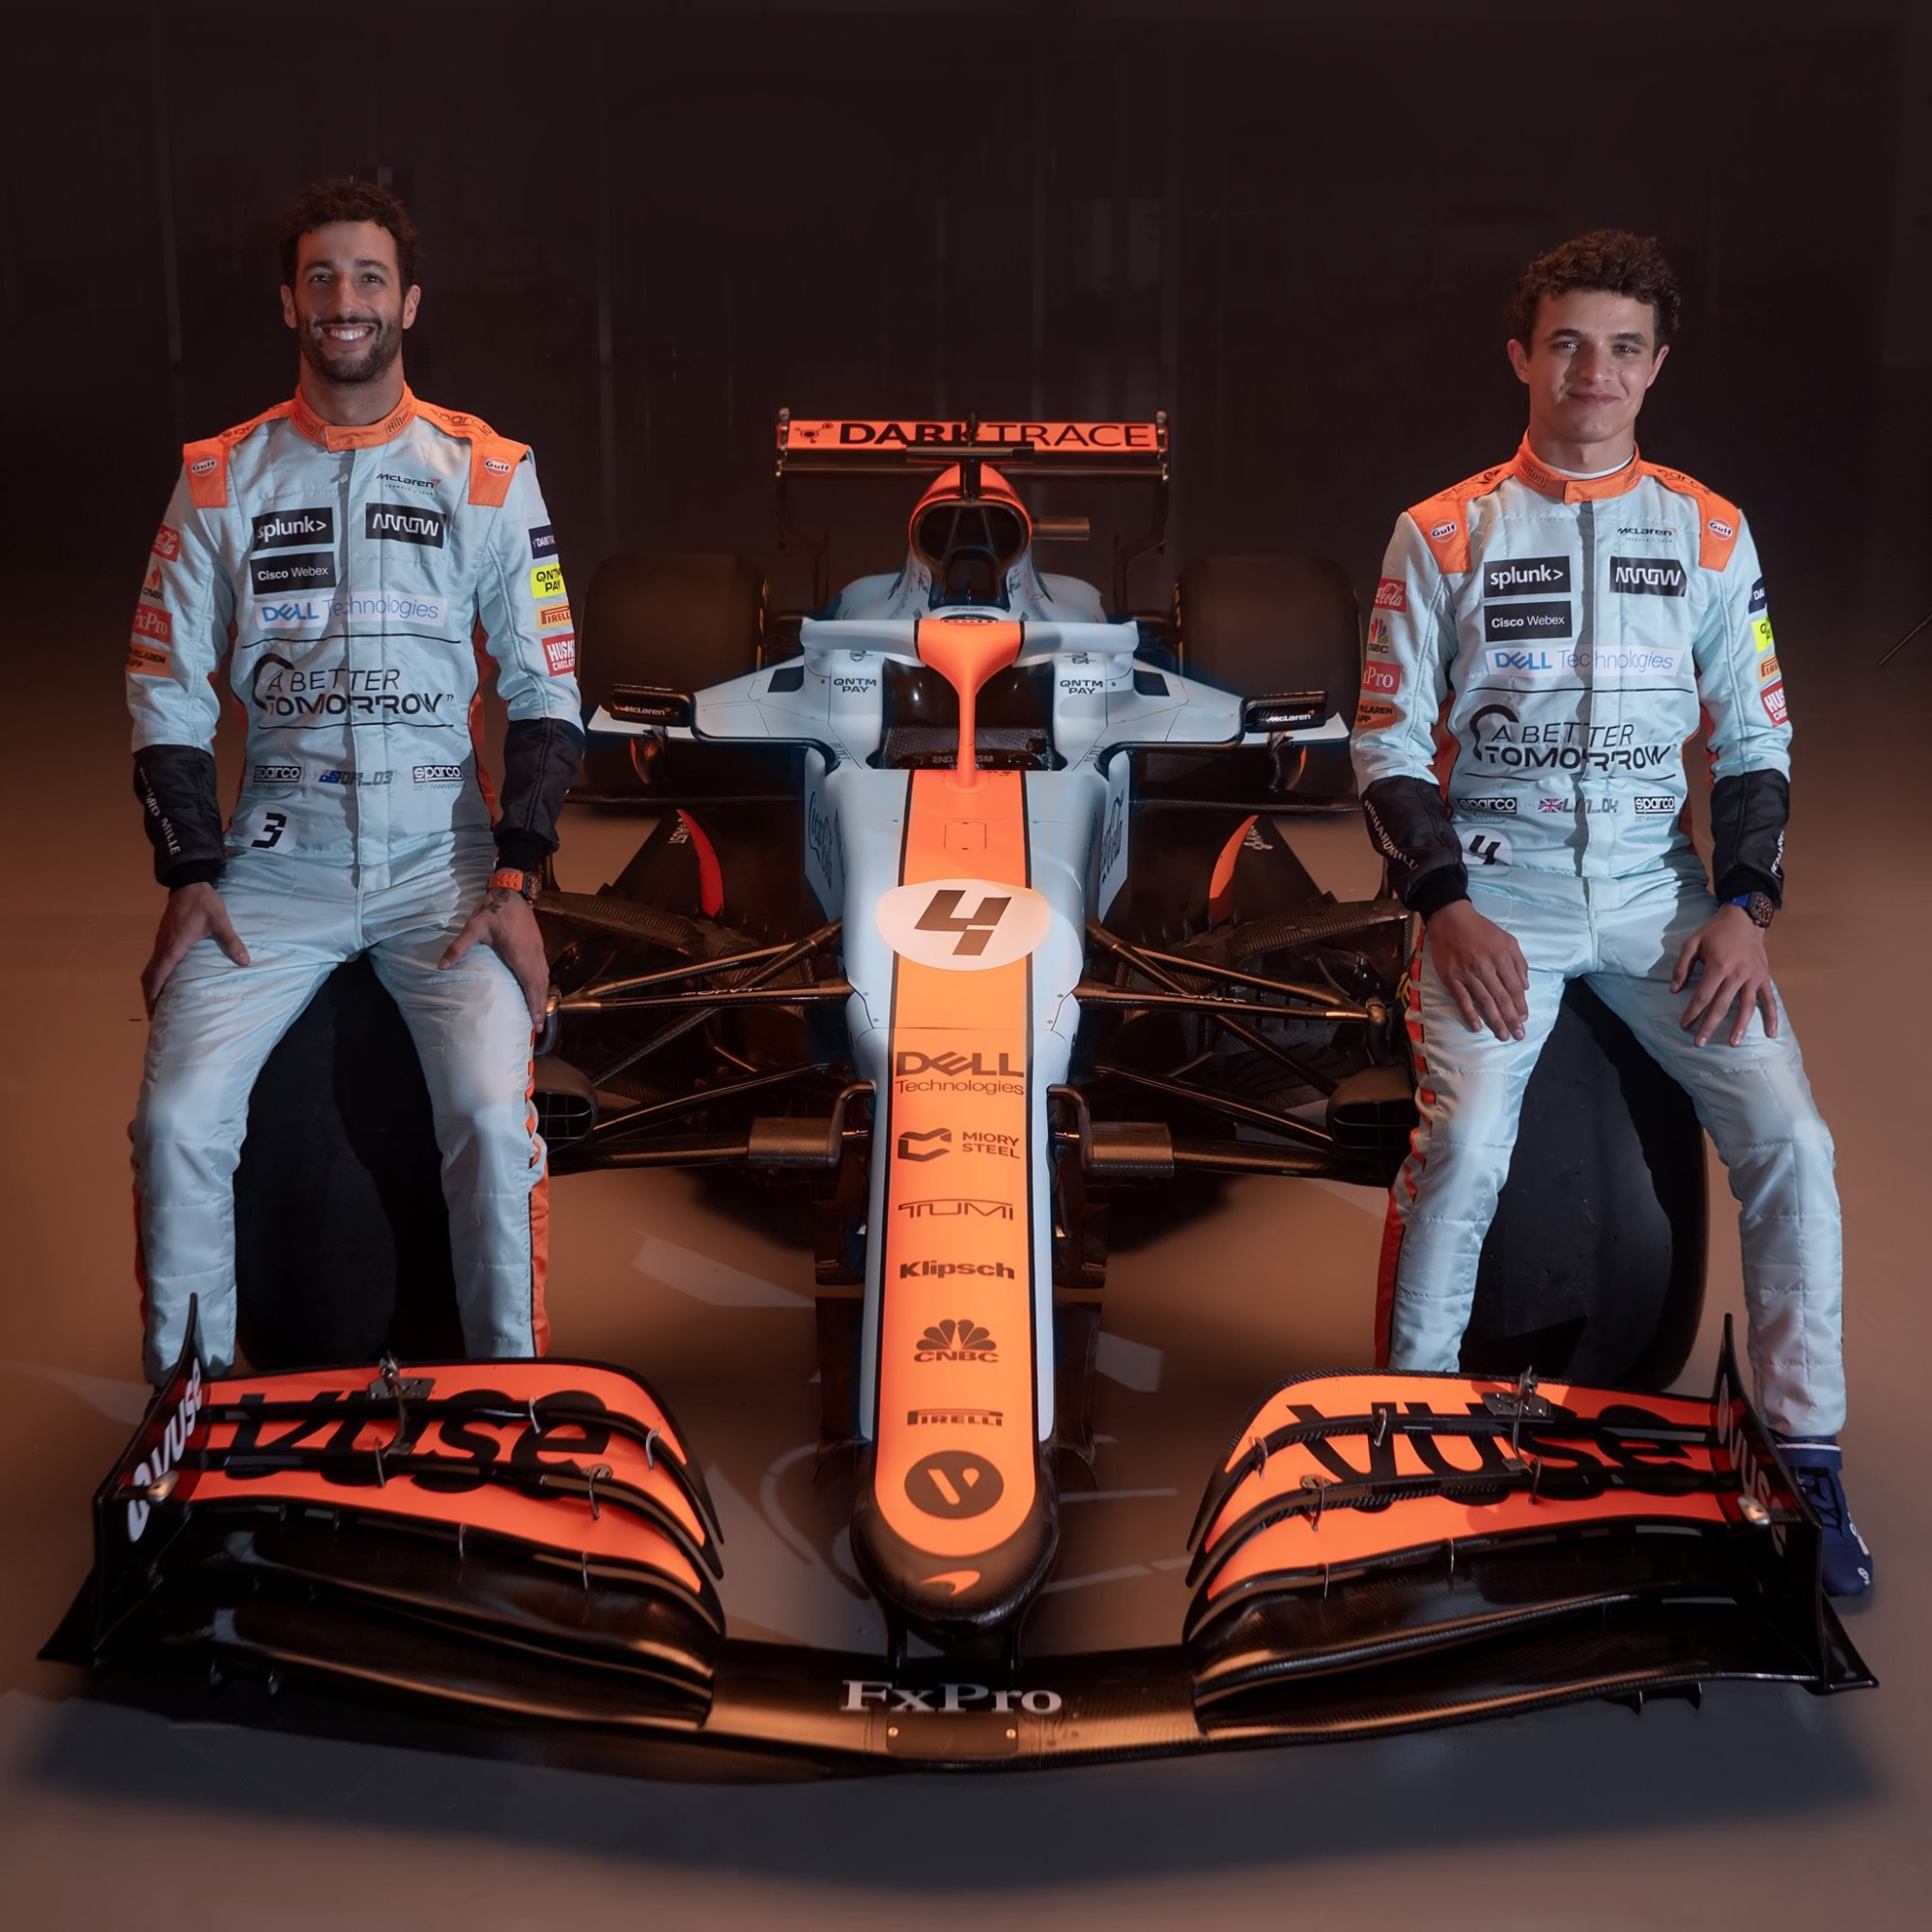 Daniel Ricciardo e Lando Norris sentados no carro de Fórmula 1 da McLaren visto de frente